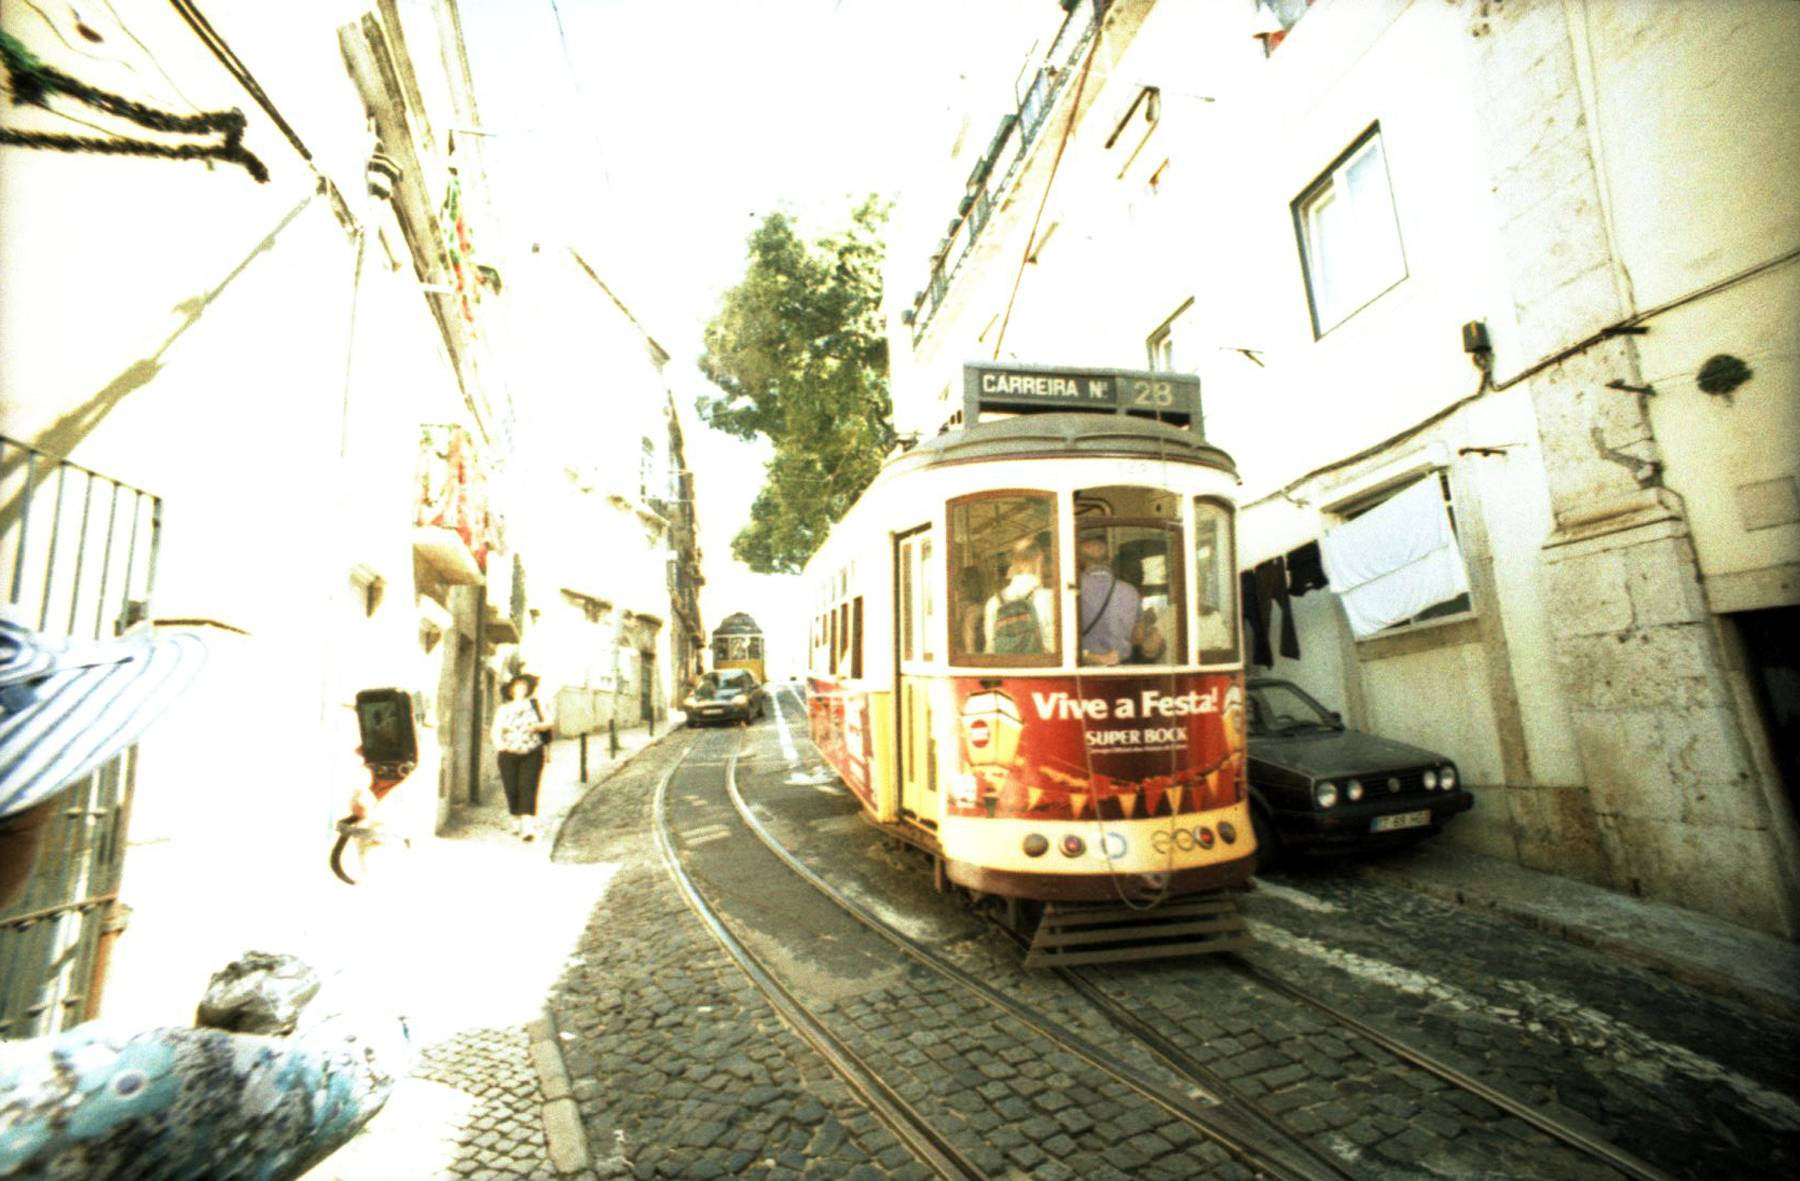 Portugal de norte a sul - Estoril